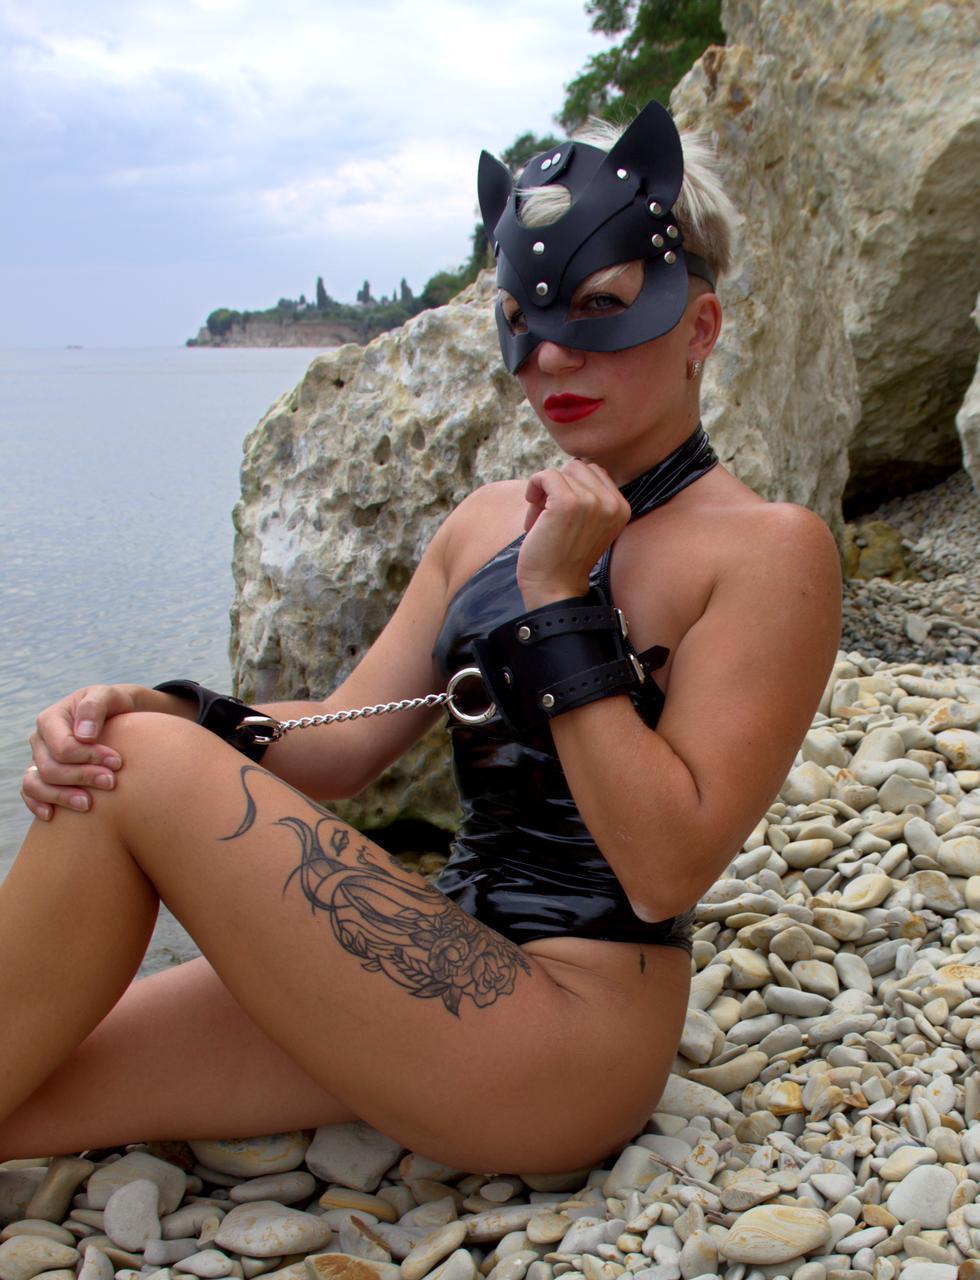 Jenny_cristall live cam on Cam4.com